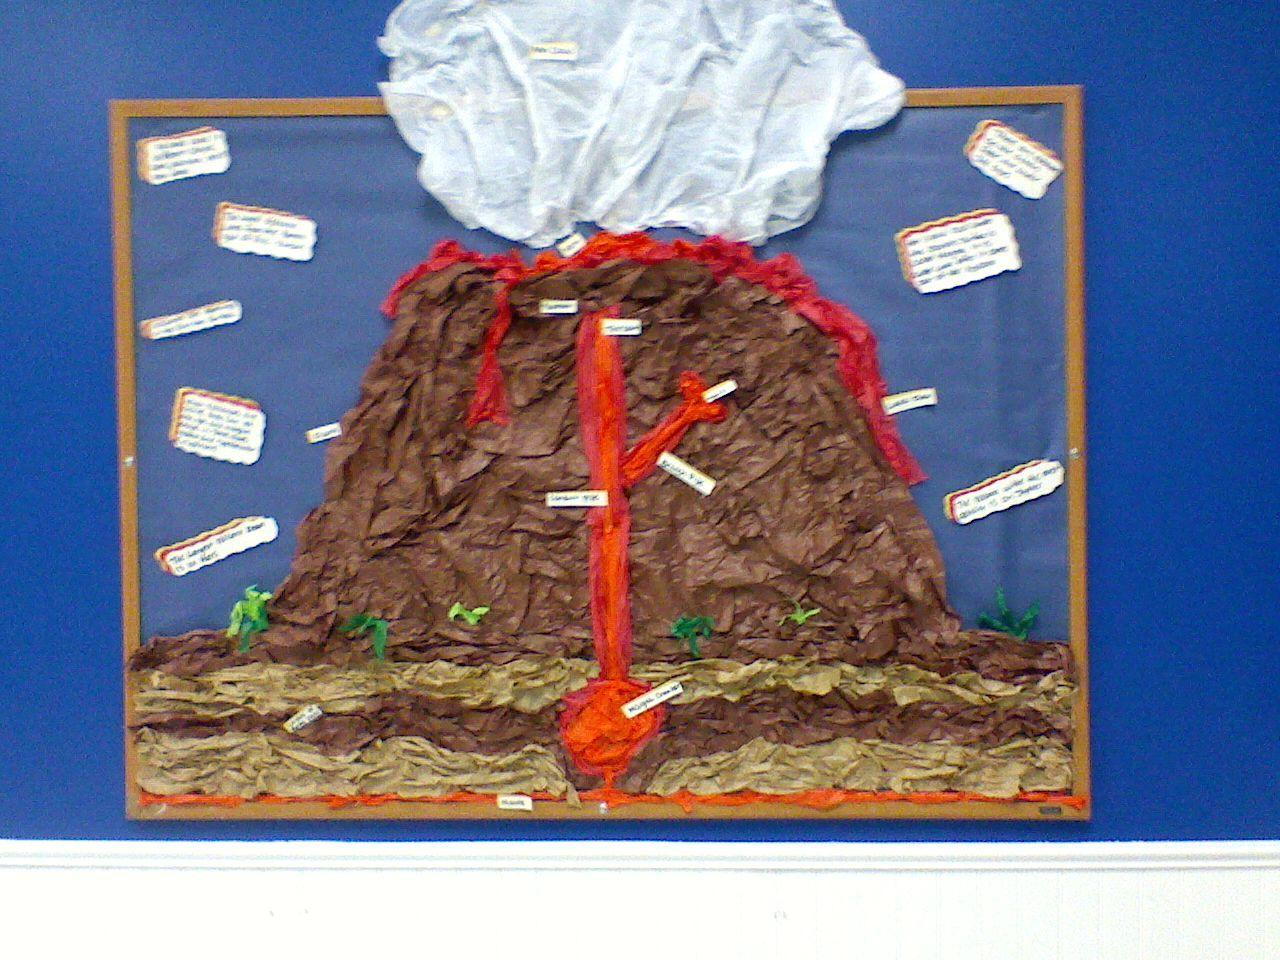 Make A Volcano Chemical Reactions Science Skills Online Worksheet Kindergarten Make Best Free